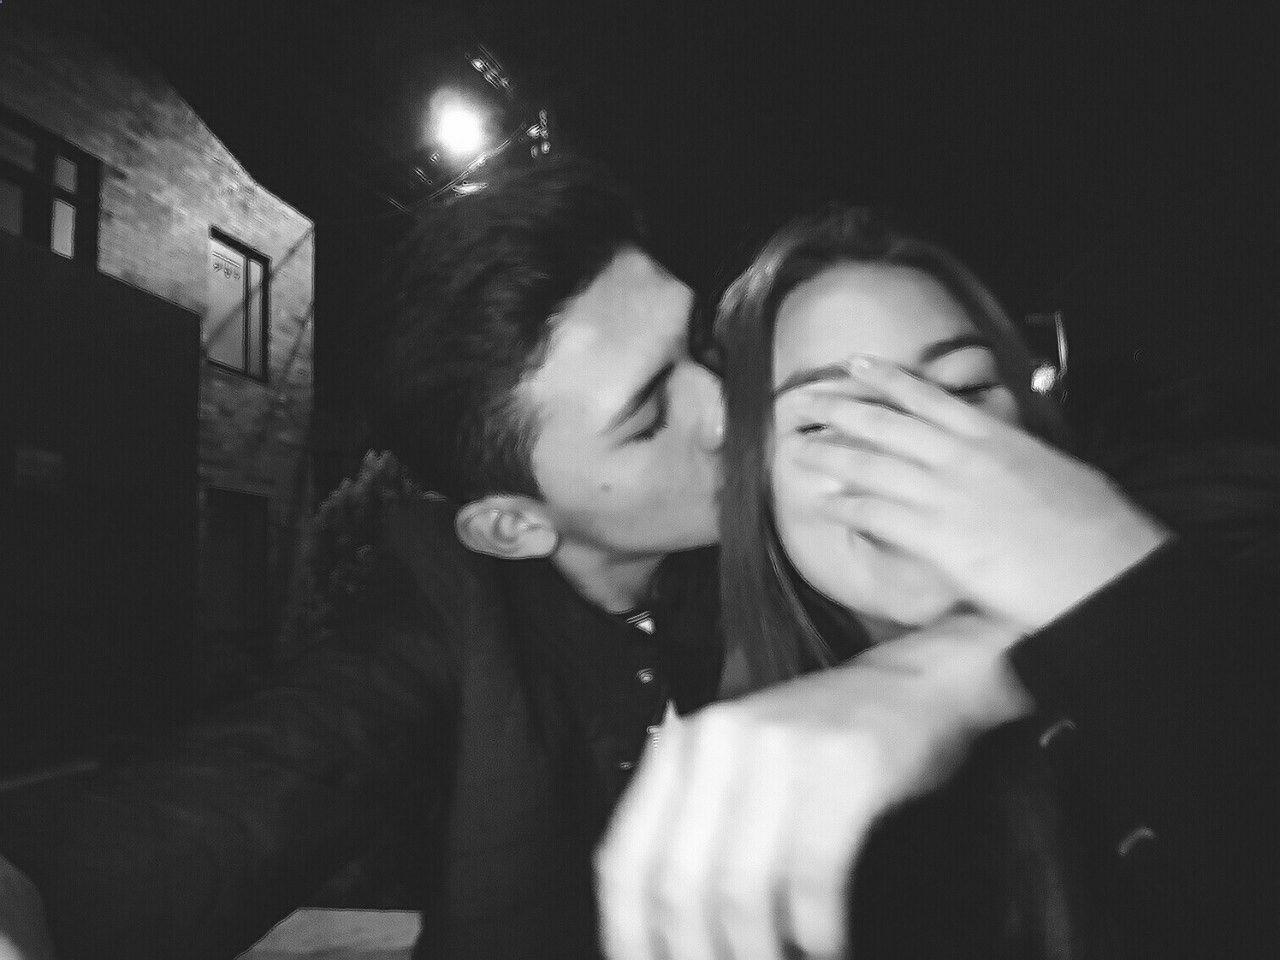 Pinterest a r y a elegant romance cute couple relationship